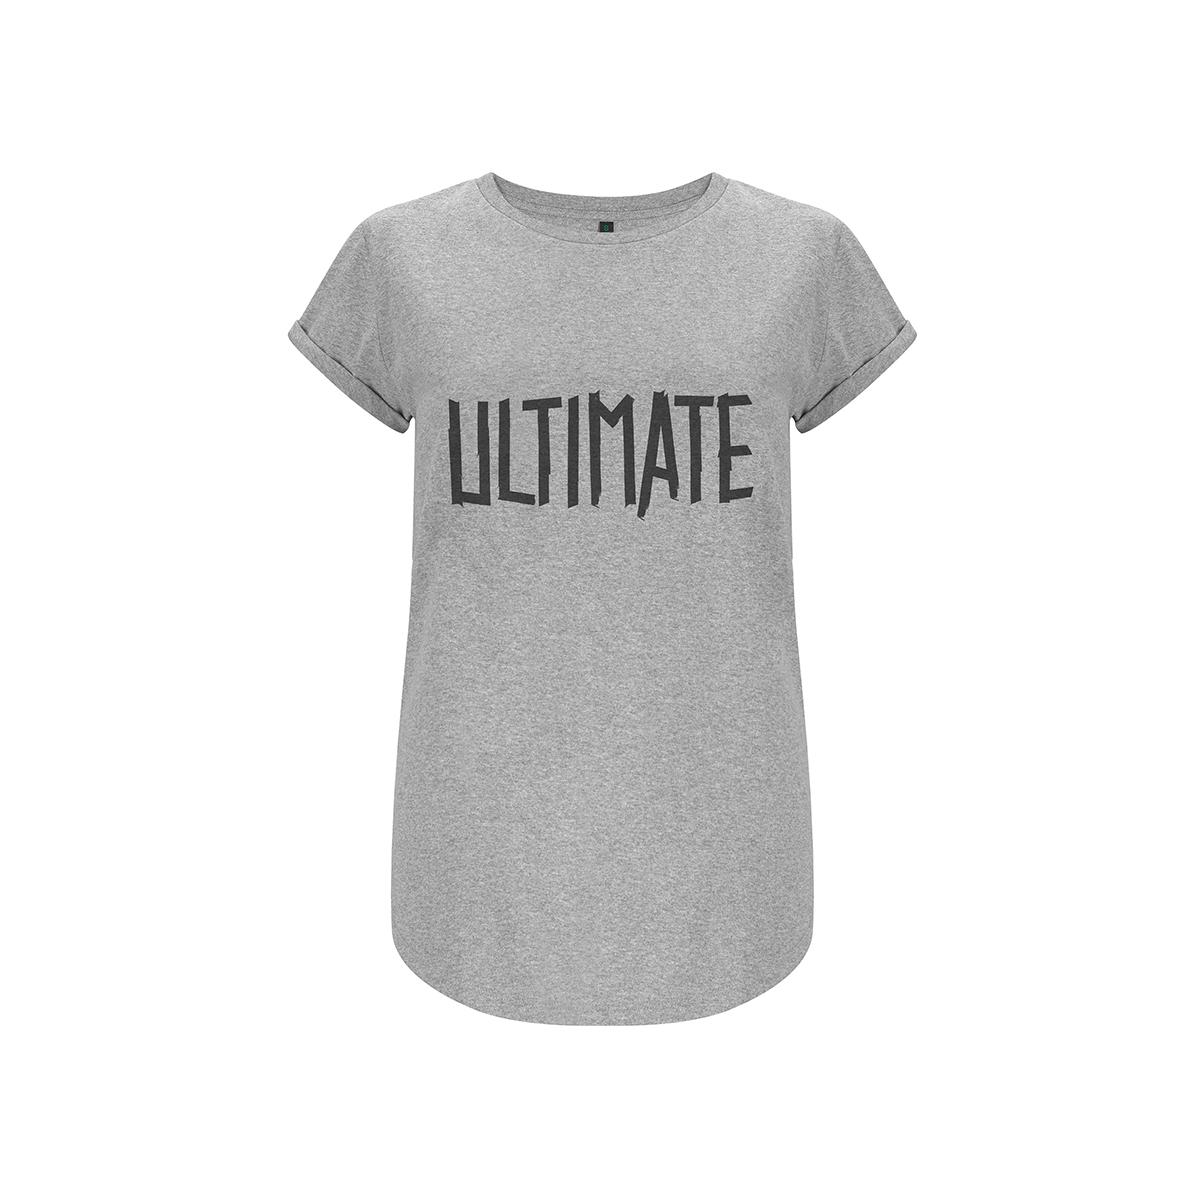 Ultimate Light Grey - Women's Tee - Bryan Adams